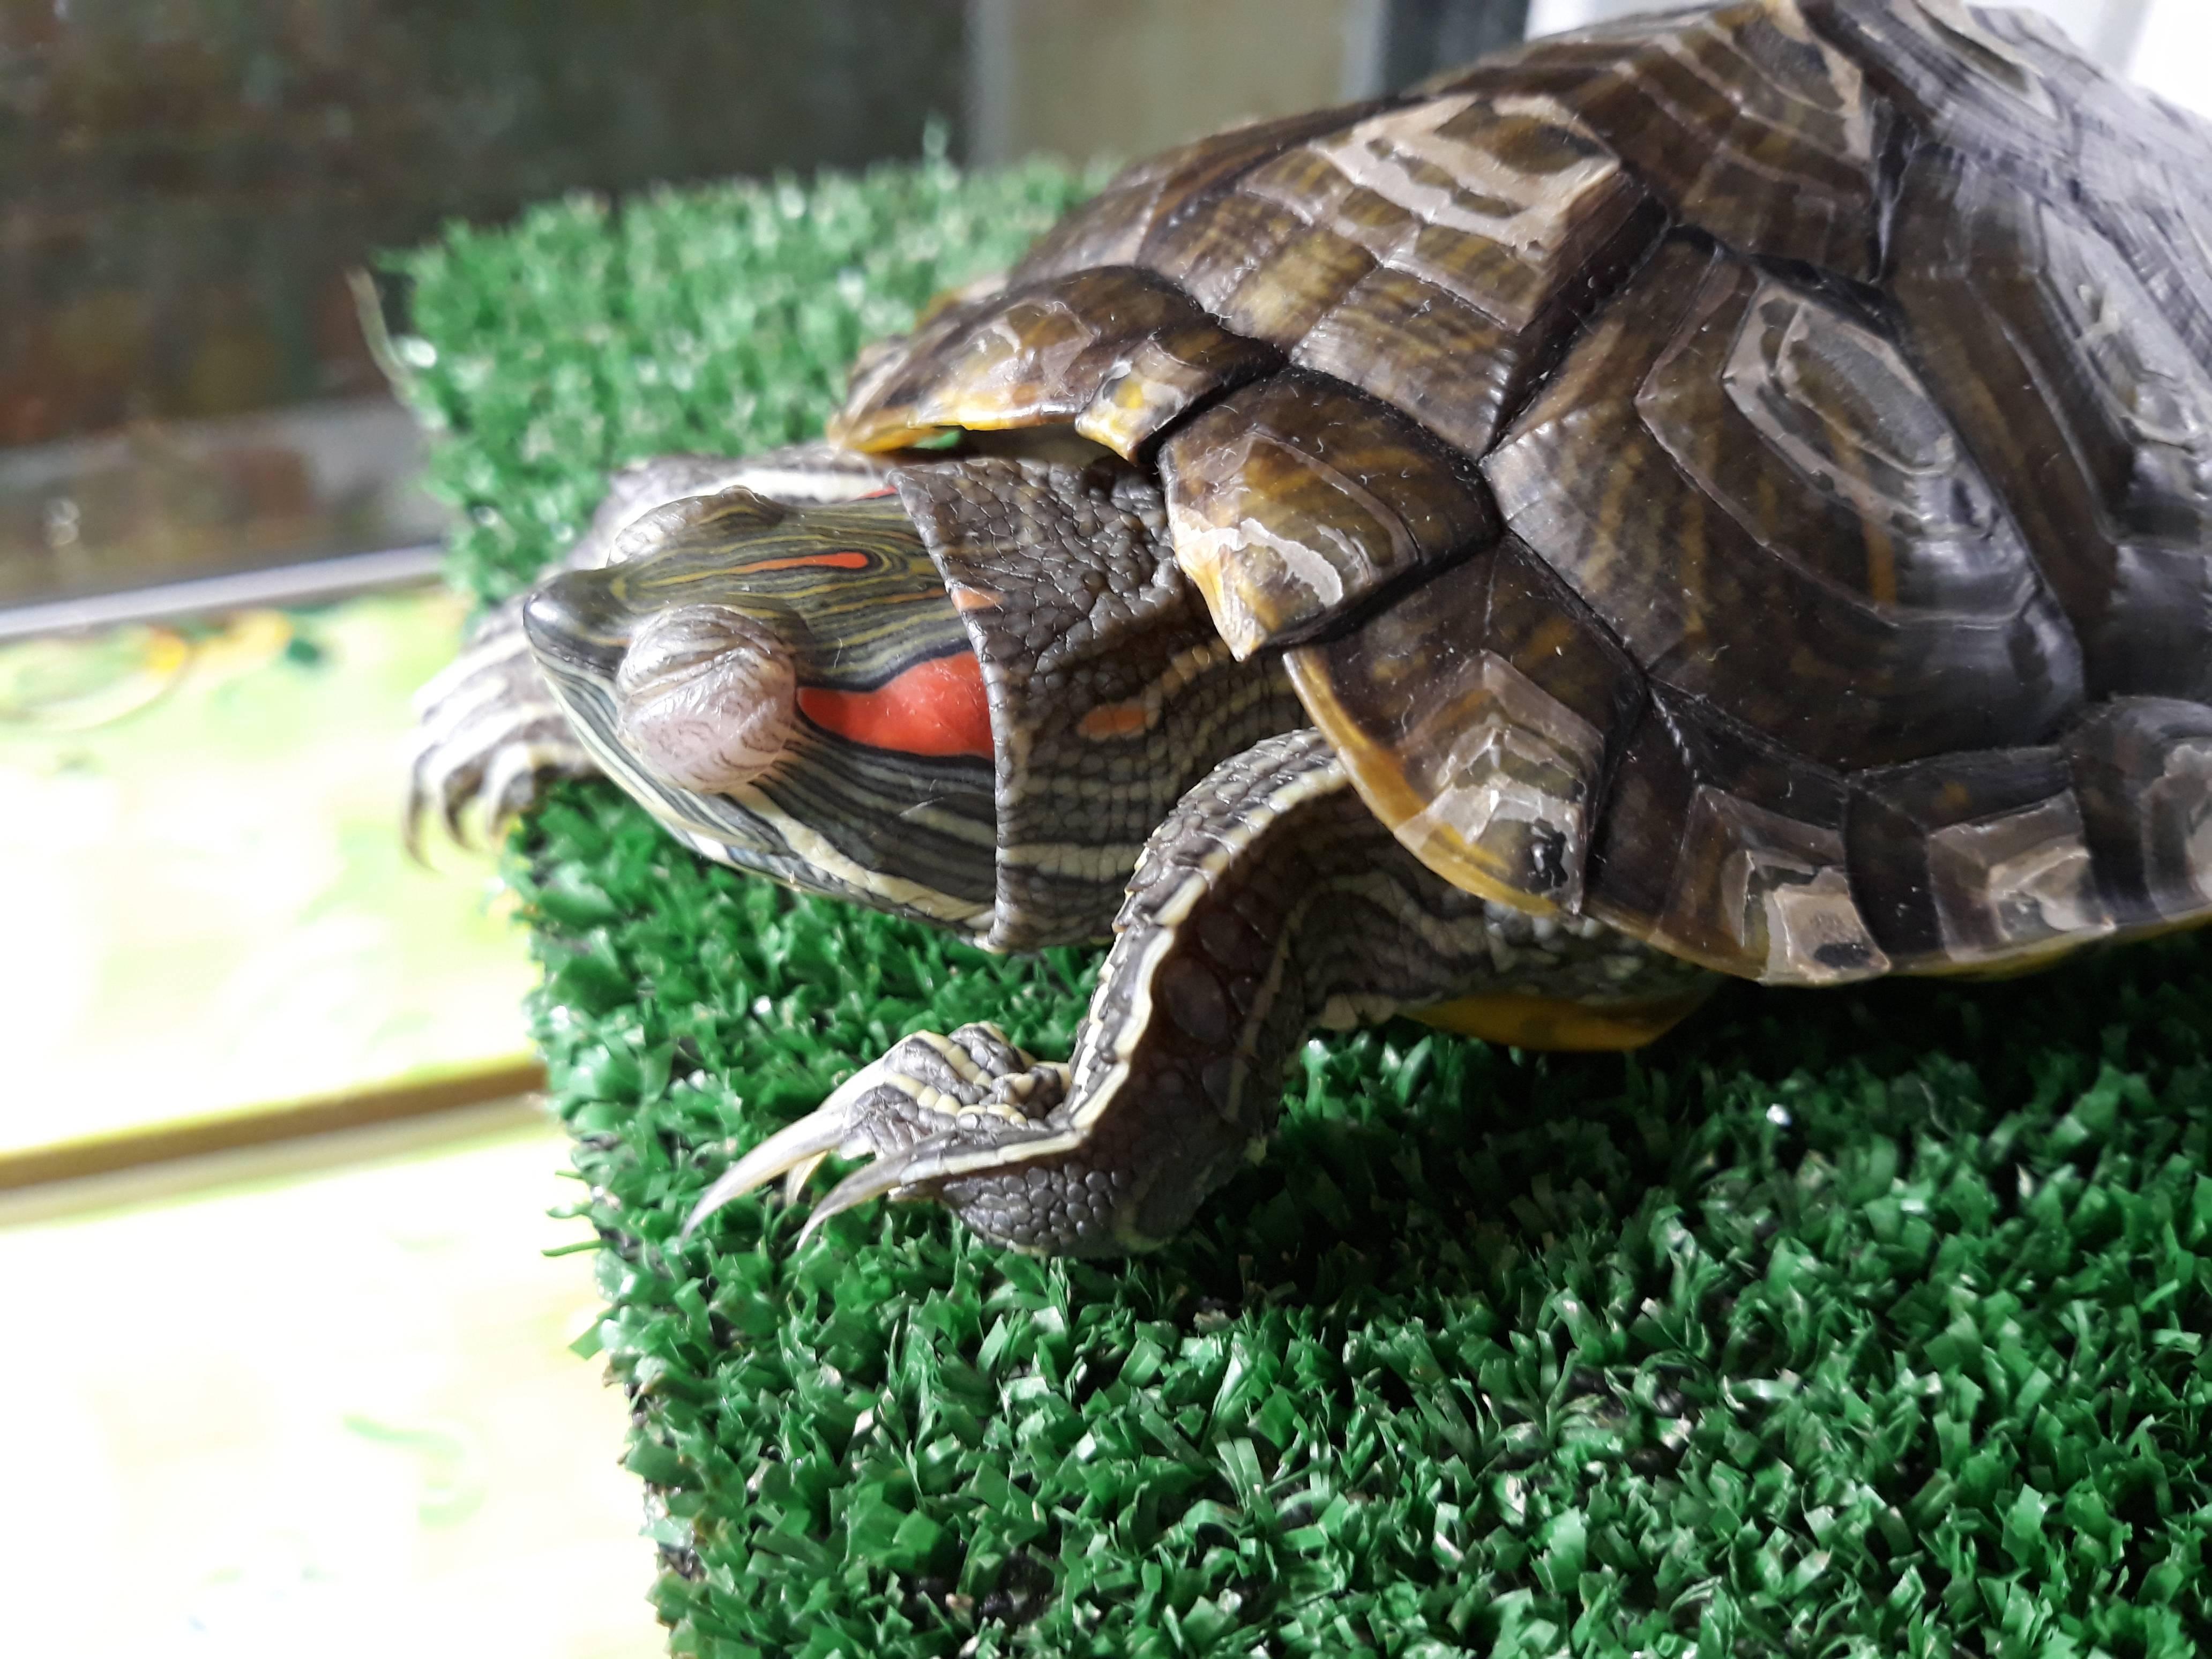 Домашние черепахи аллергия